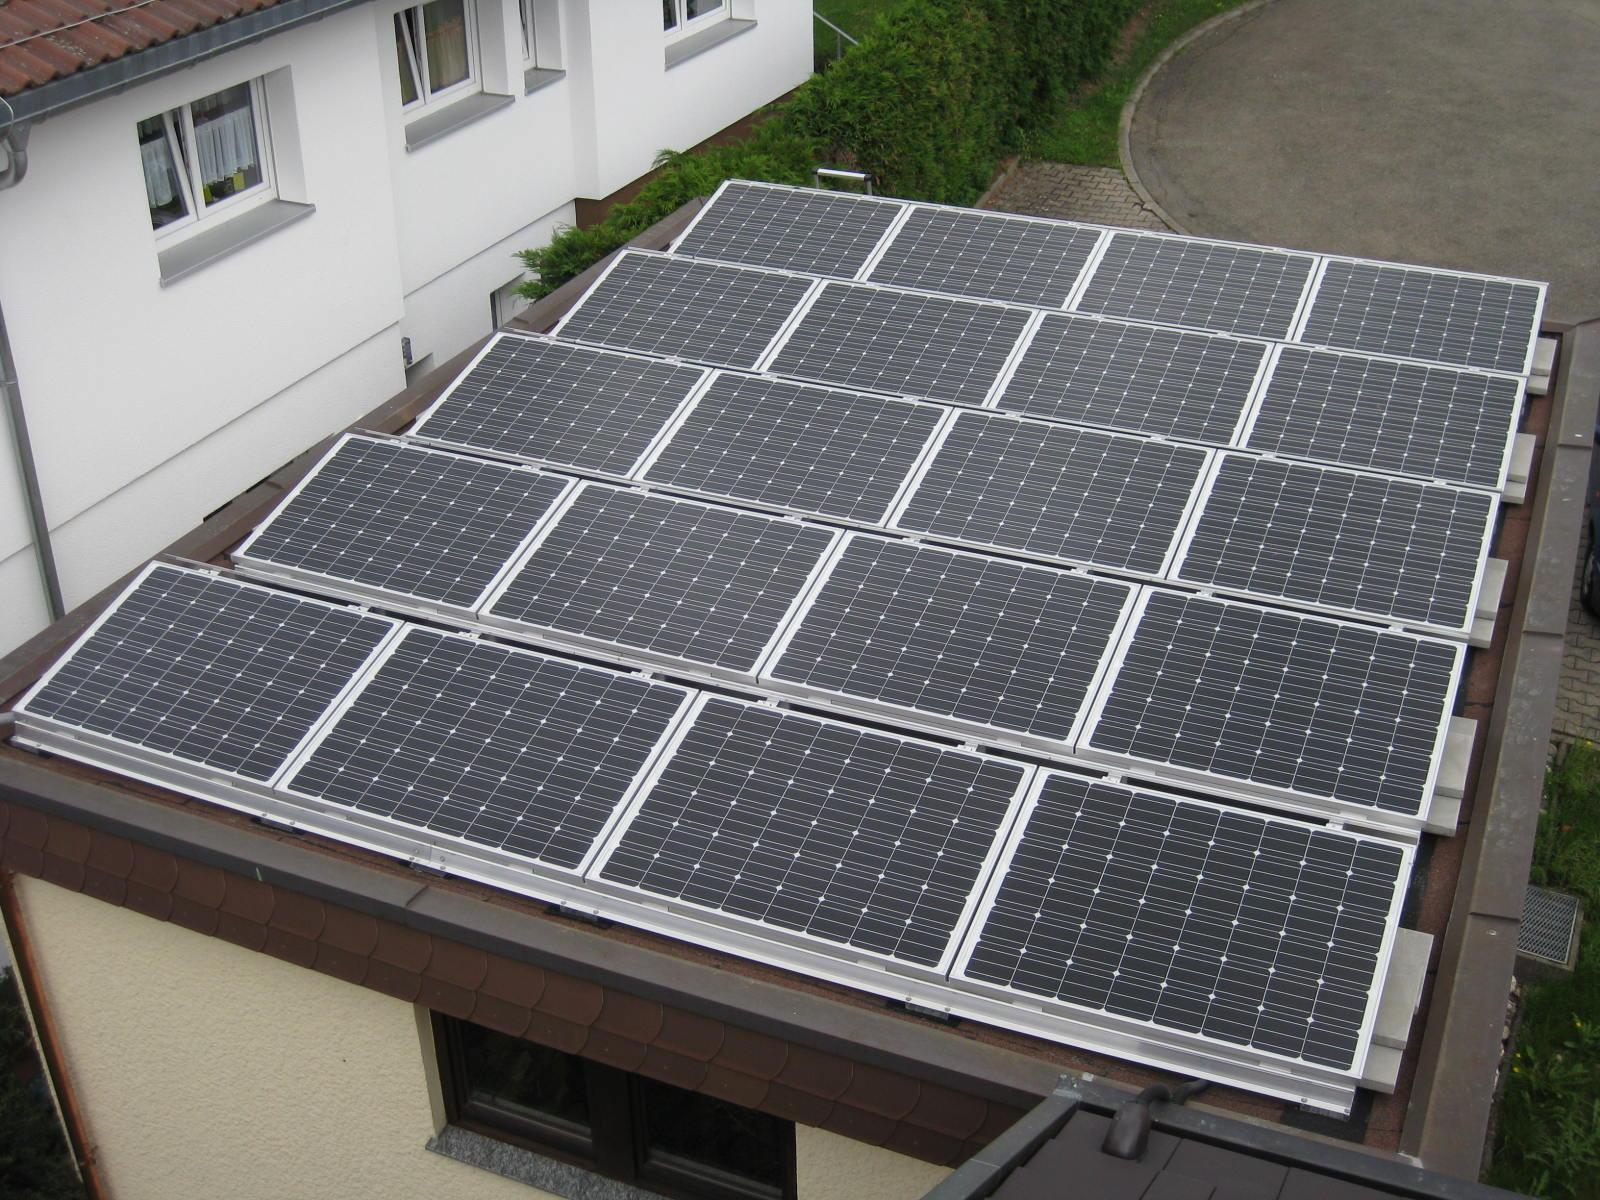 photovoltaik sonderkonstruktionen sachwert zentrum. Black Bedroom Furniture Sets. Home Design Ideas